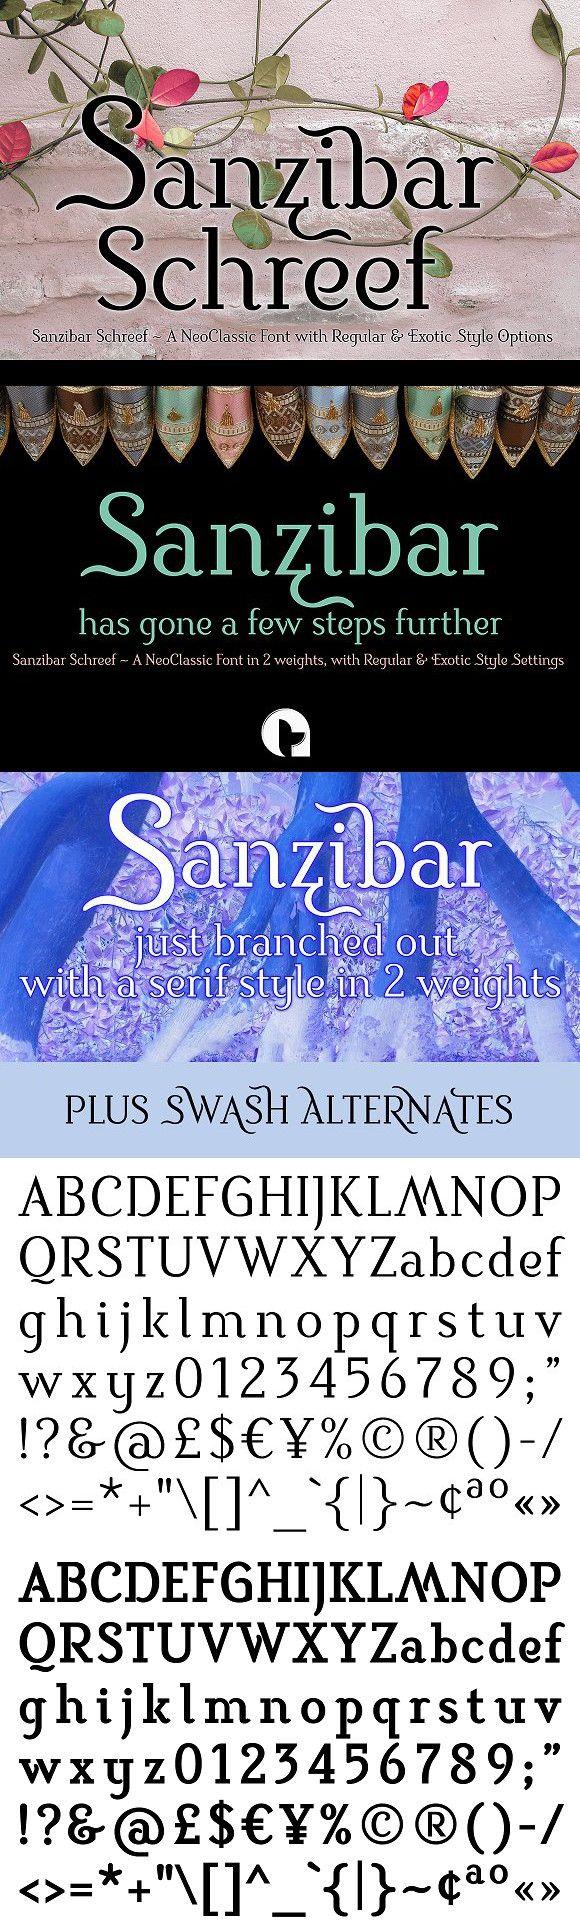 Sanzibar Schreef. Slab Serif Fonts. $39.00